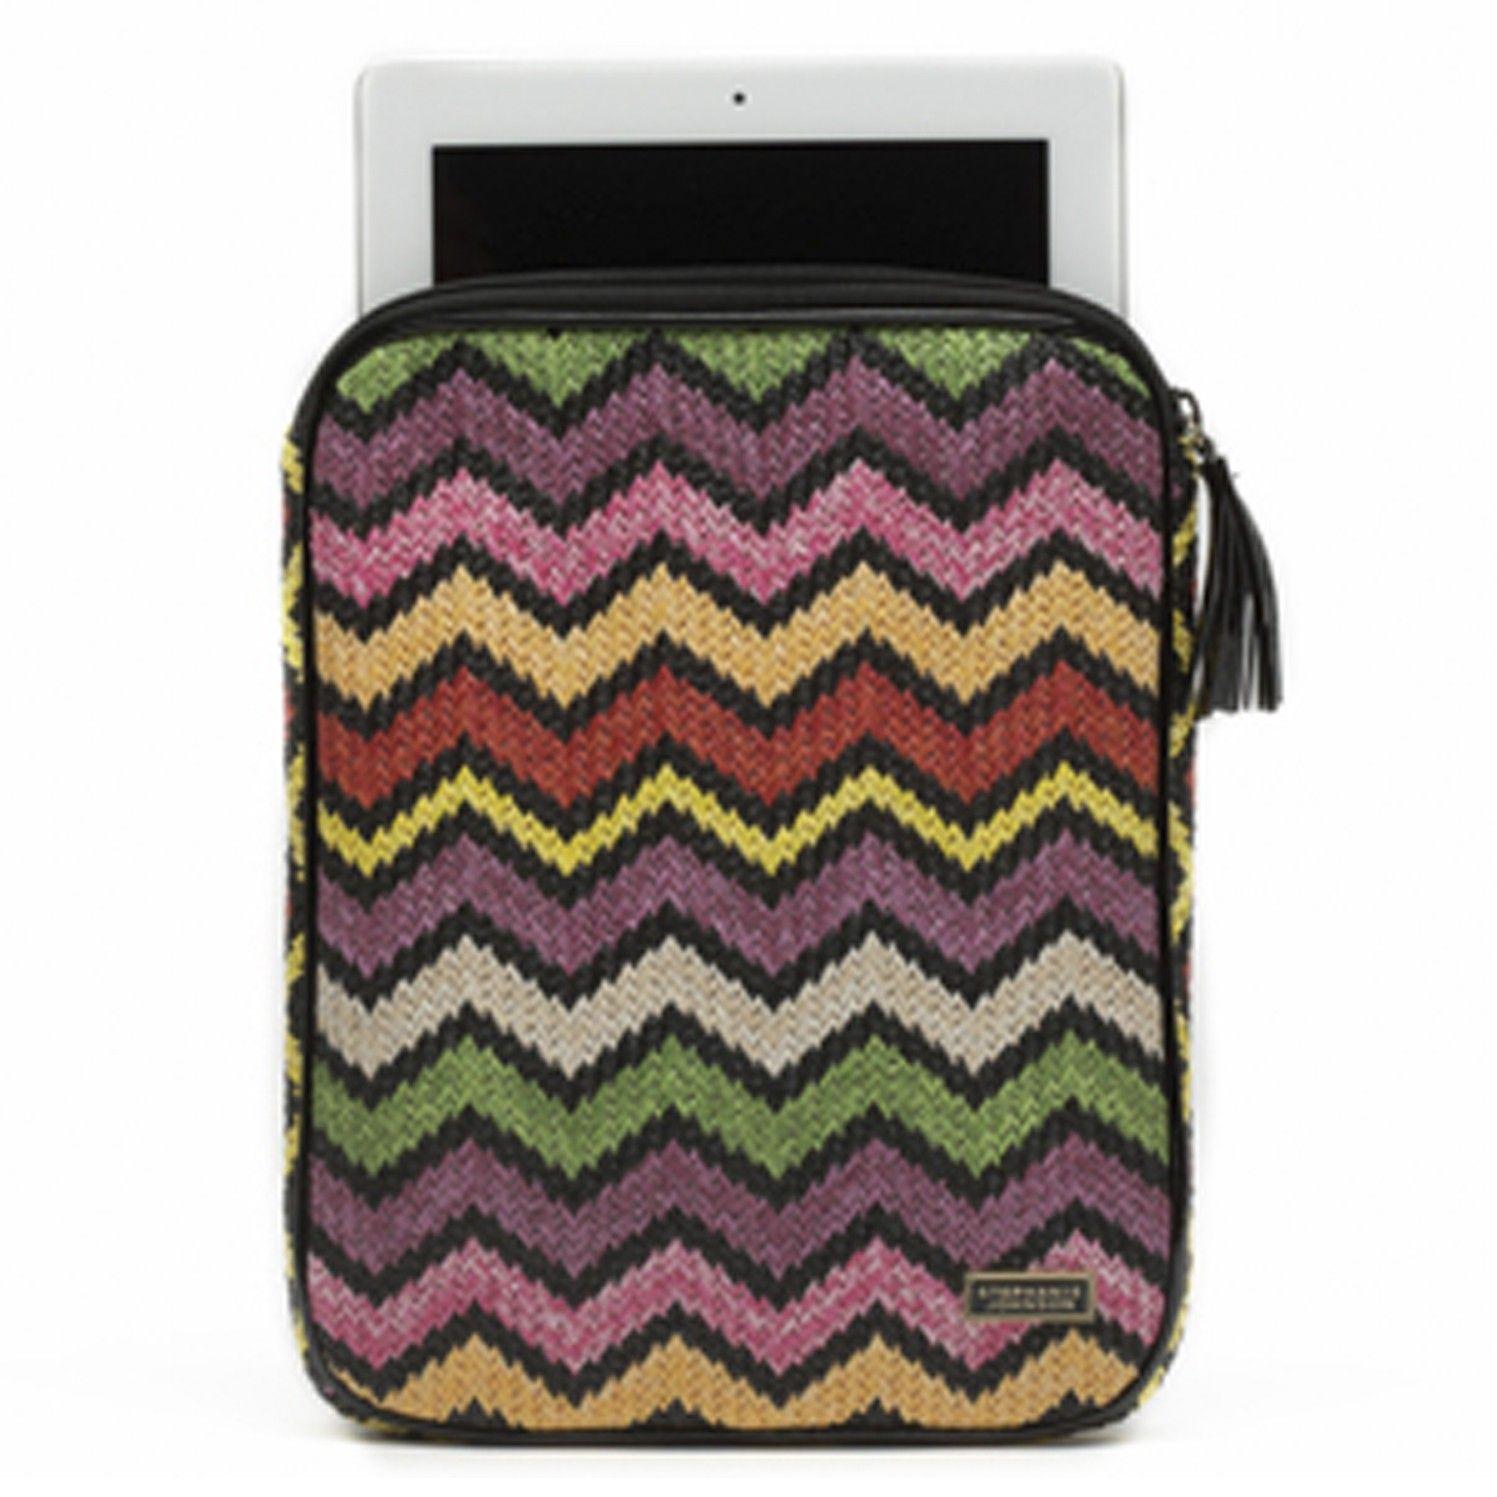 Stephanie Johnson Turin Collection iPad Case Purses and